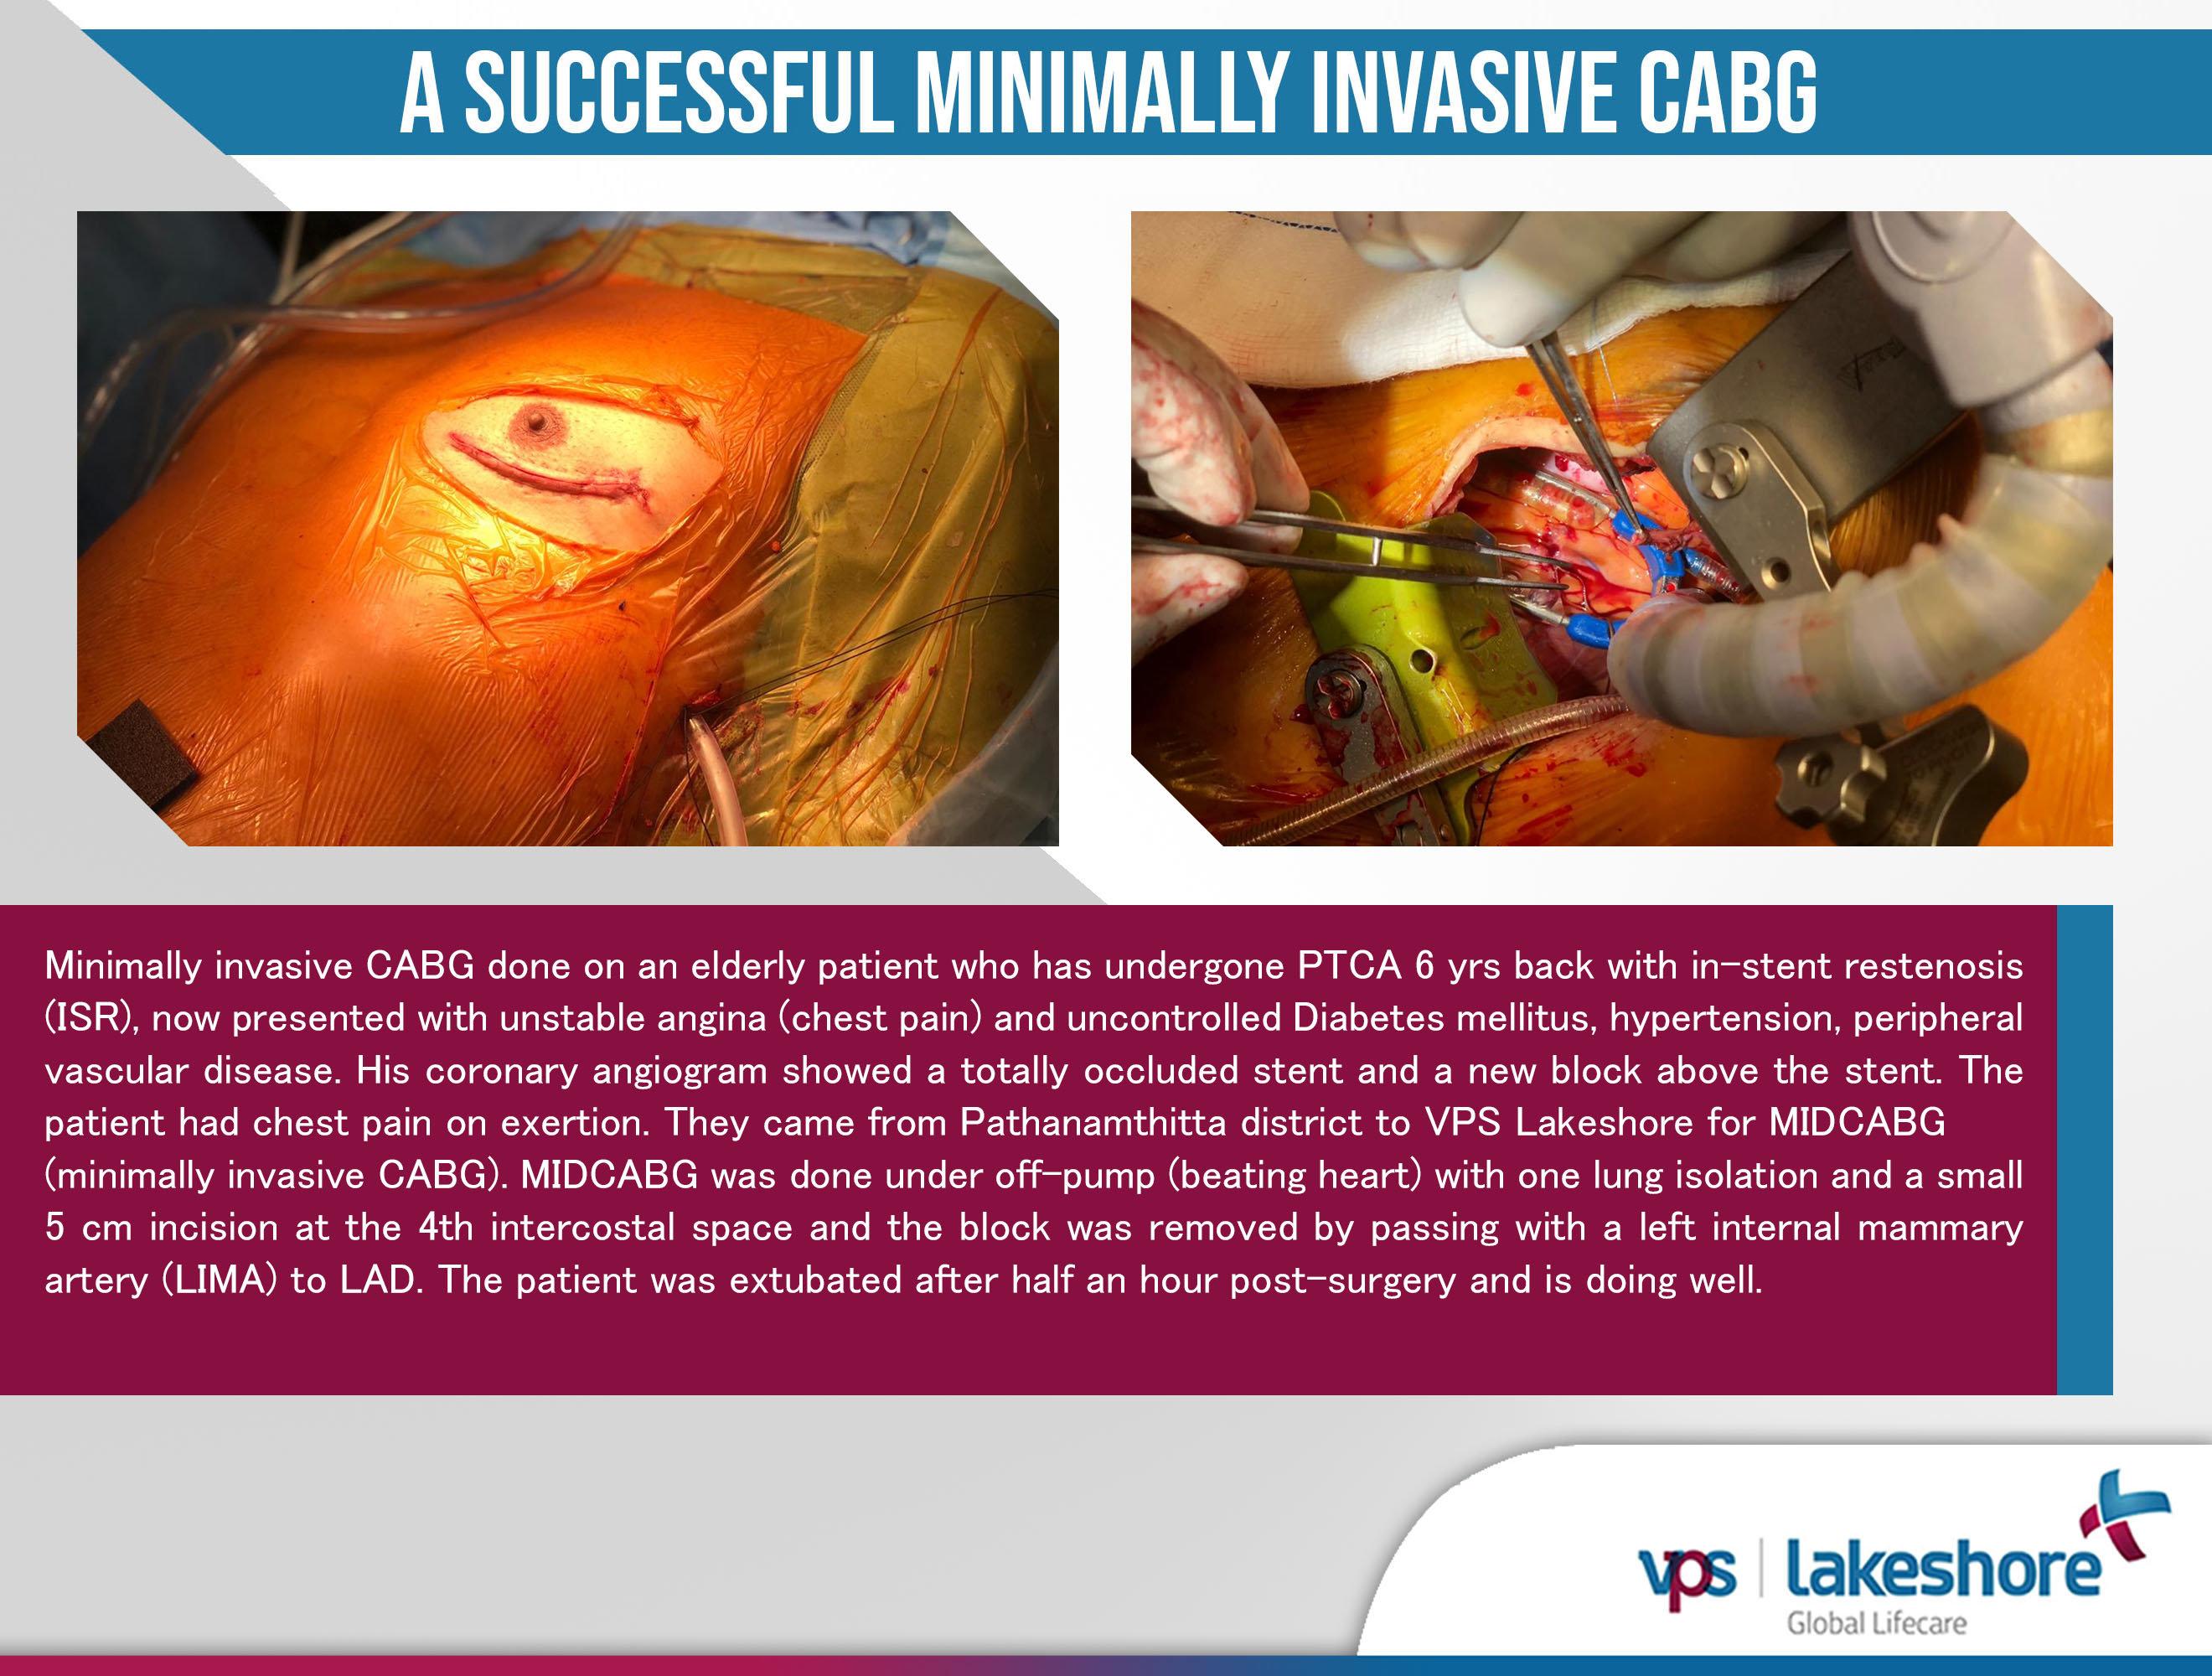 A successful Minimally Invasive CABG